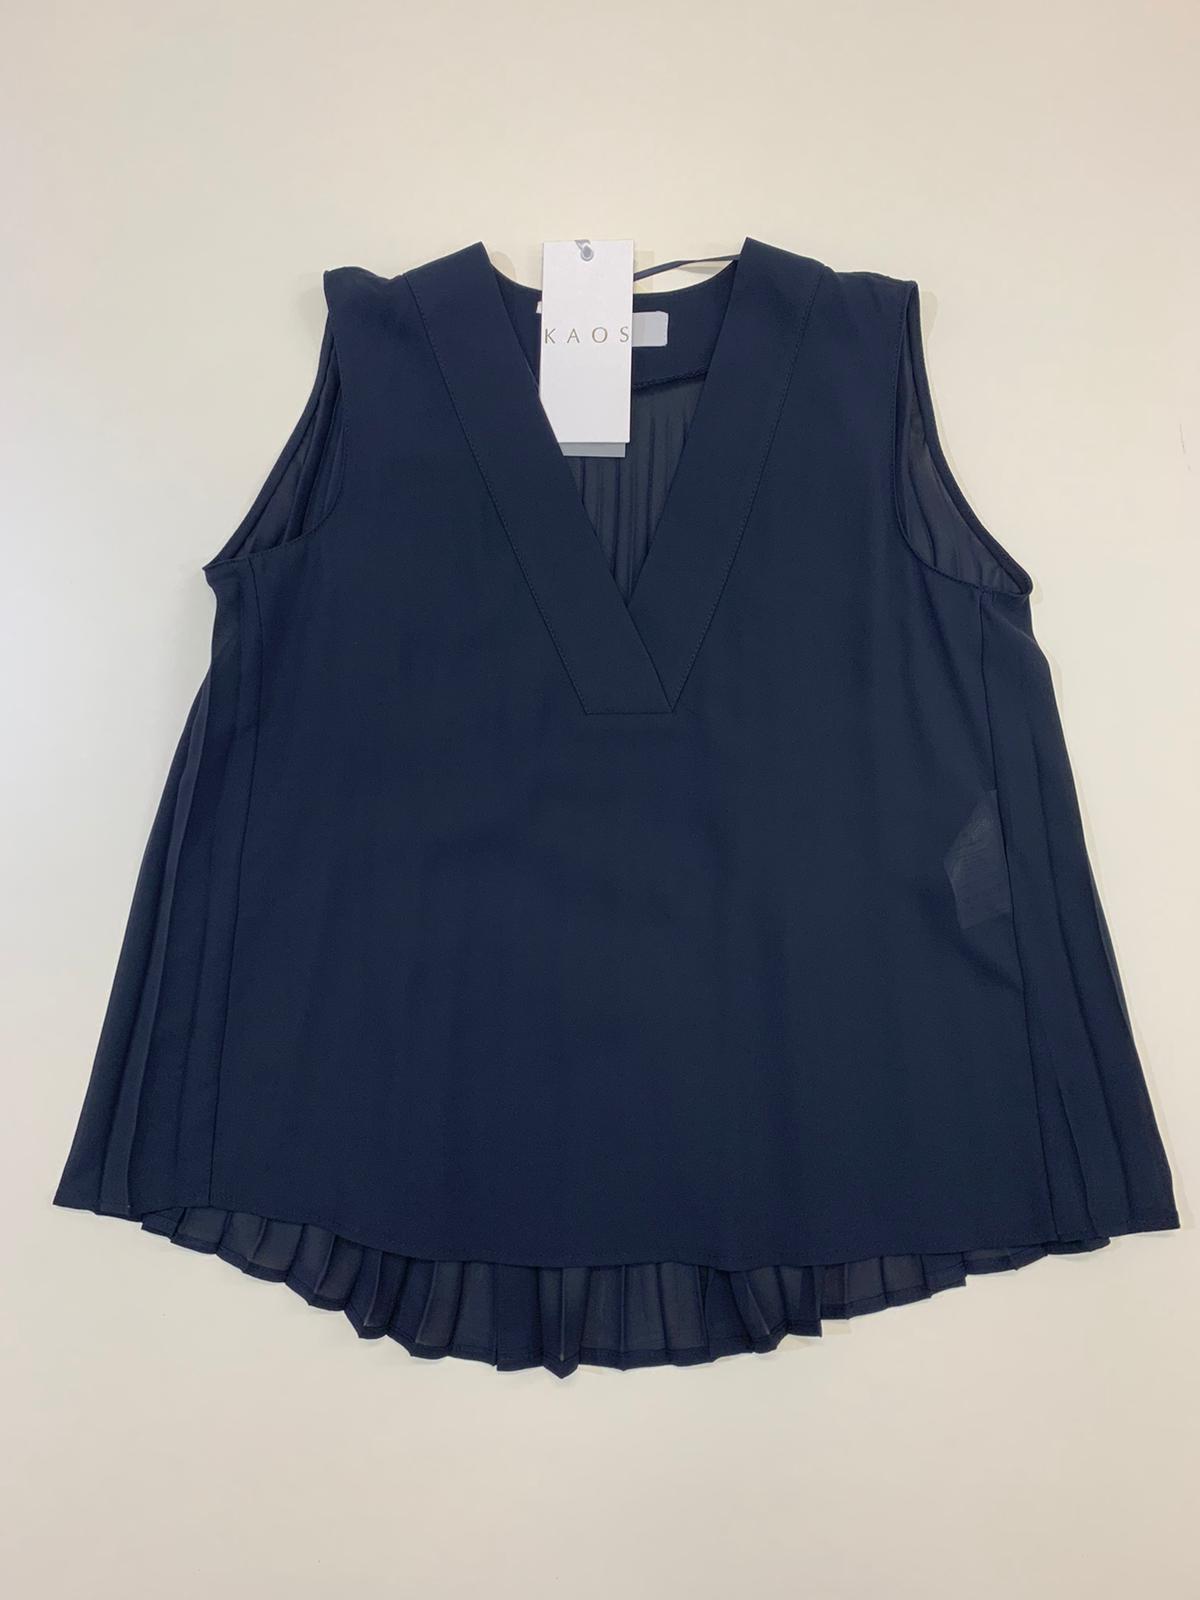 Top Donna Kaos Collection Plisse Dietro Blu